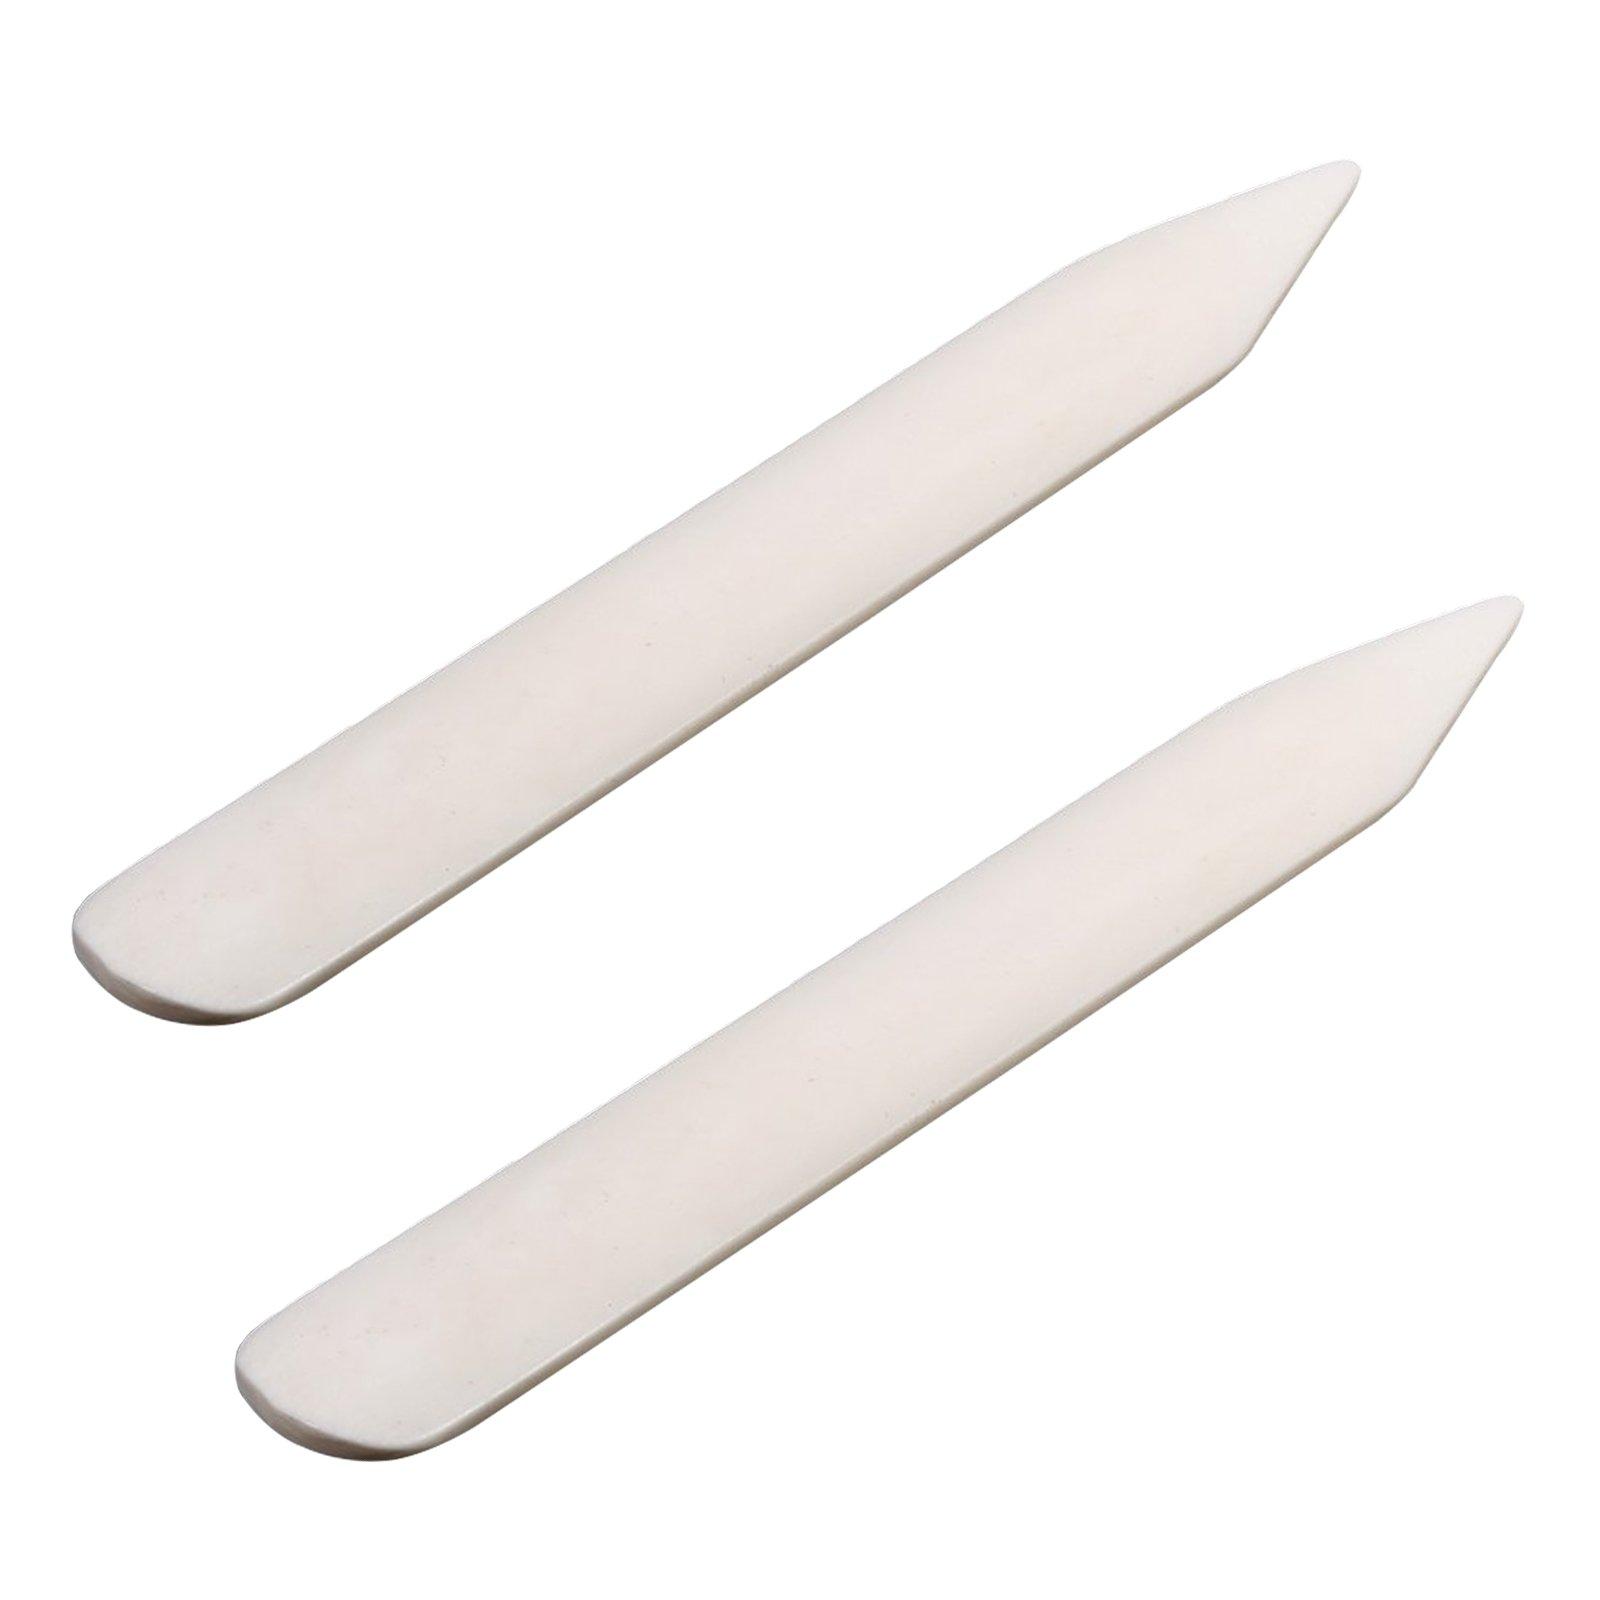 VENCINK Genuine Bone Folder Paper Creaser Crafts Scoring Folding Creasing Paper Crafting Tool Set for DIY Handmade Leather Burnishing Bookbinding Books Cards and Paper Crafts (2 bone folfer)